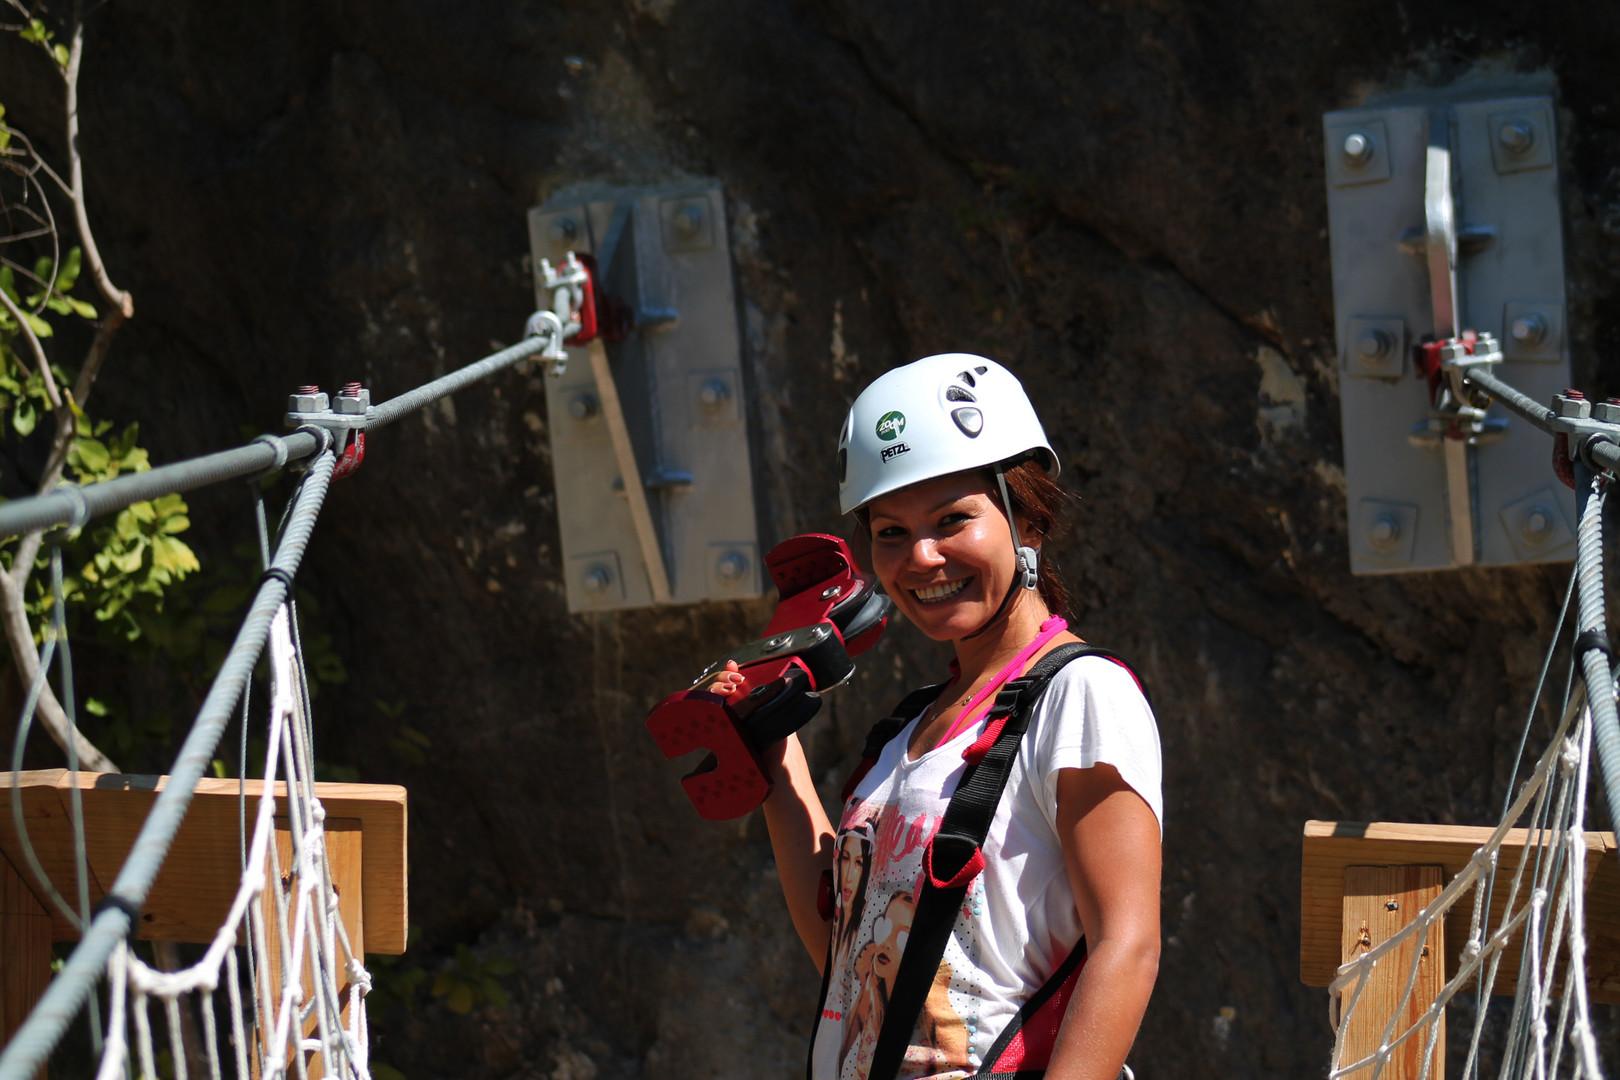 woman holding zipline component